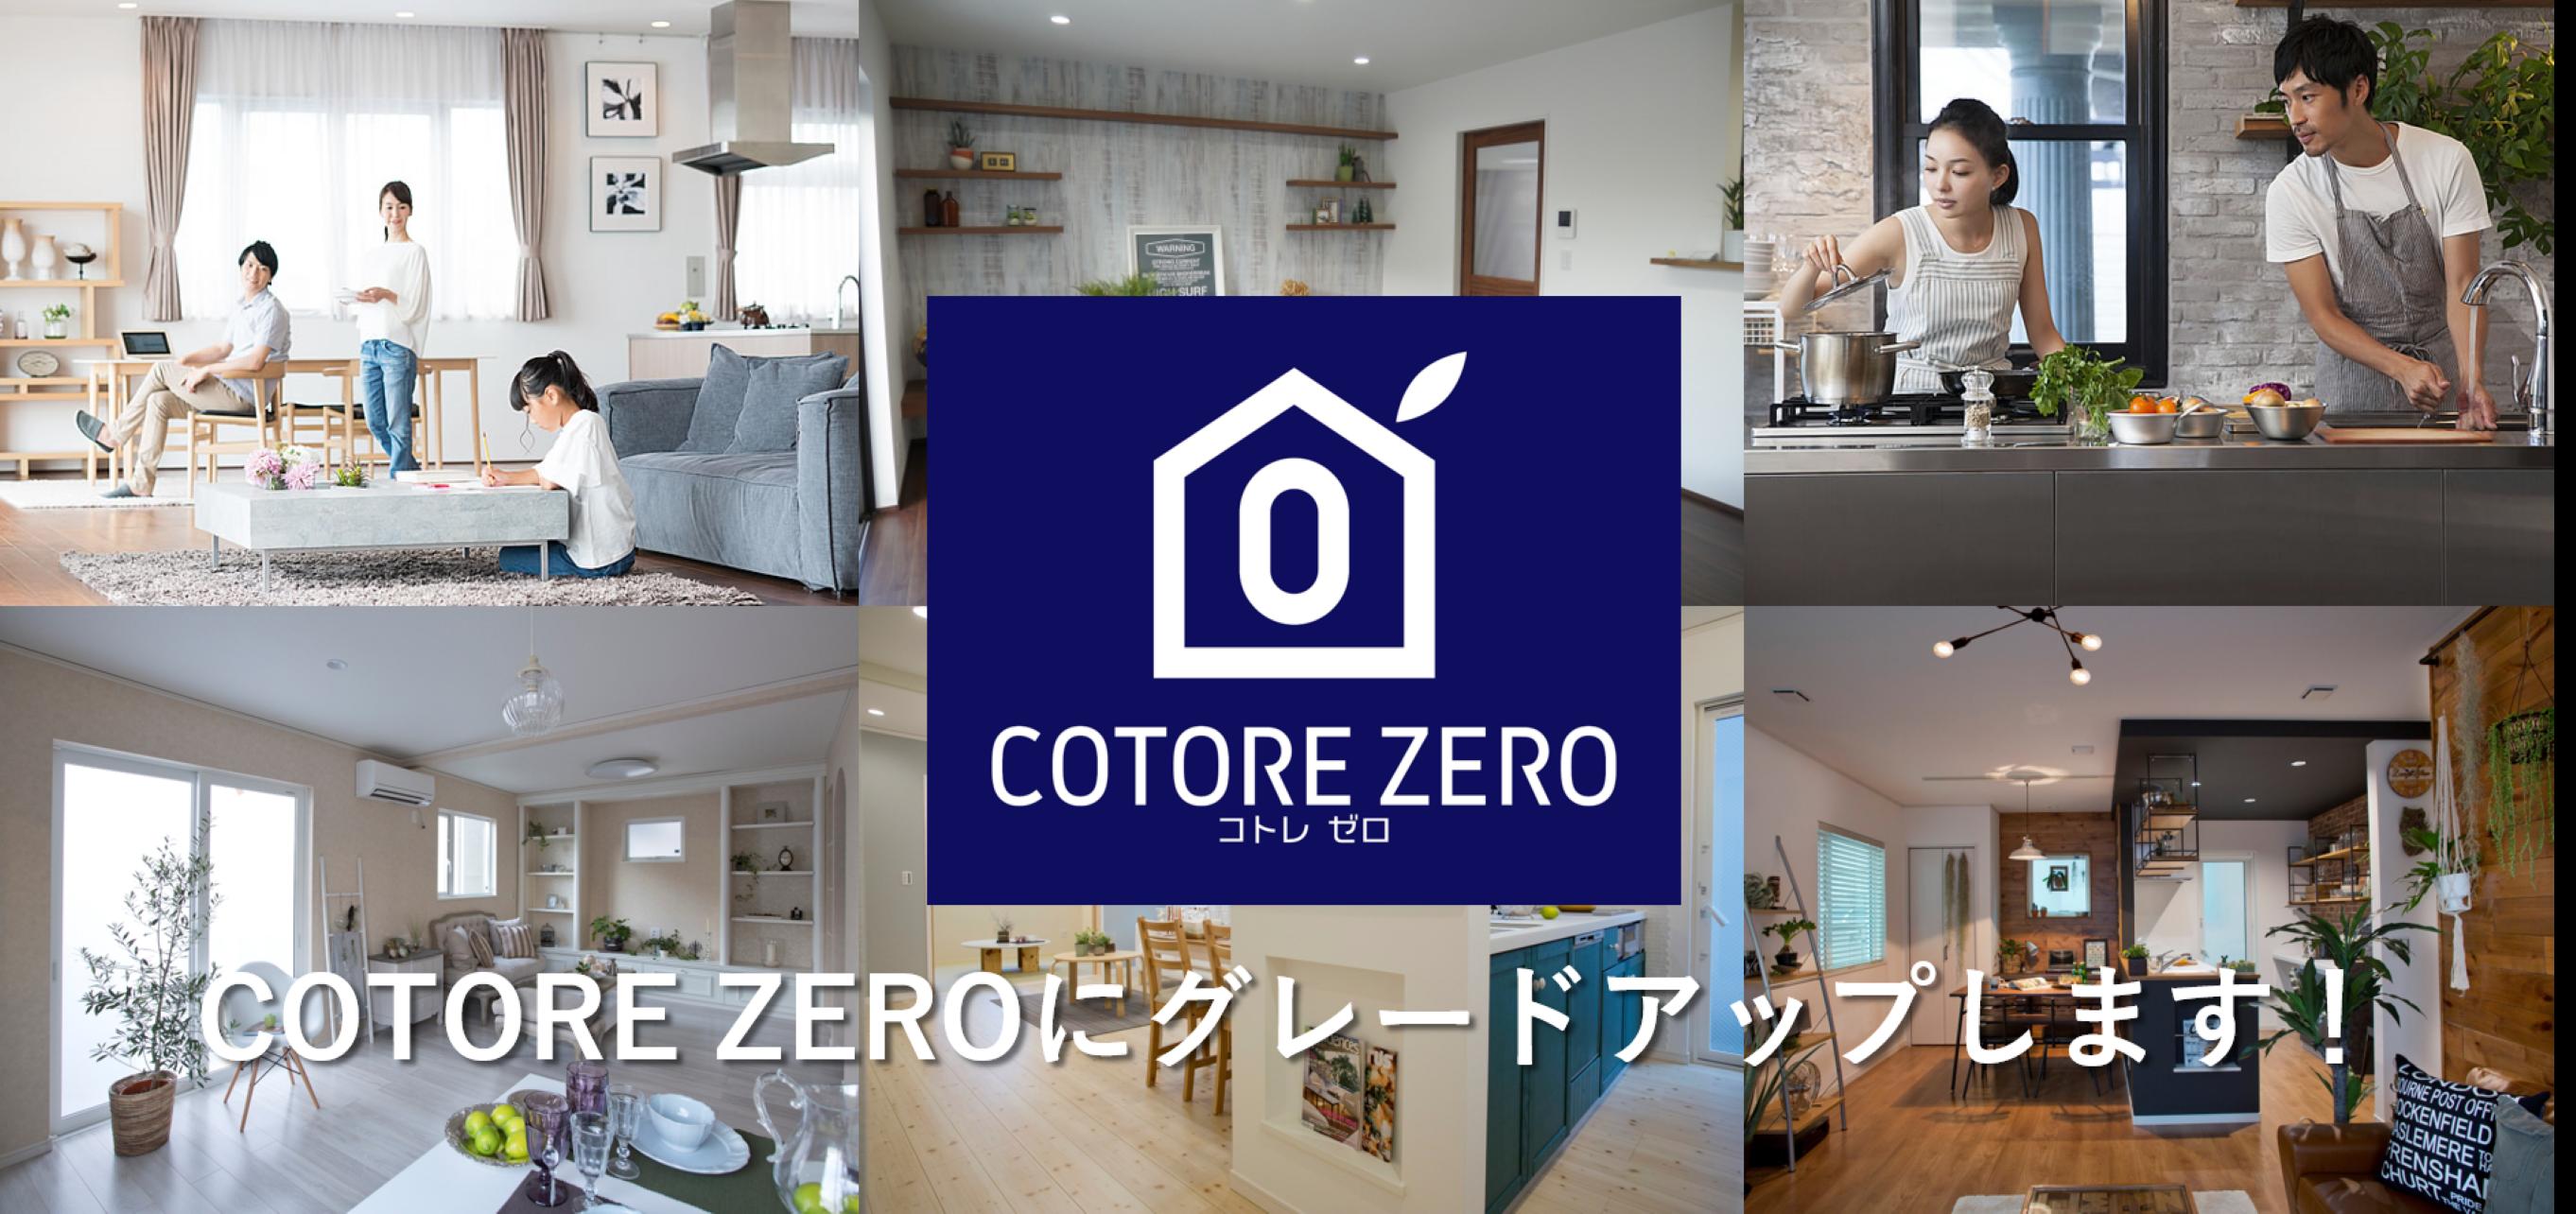 COTORE 1,090万円から実現できる超高性能なスマートハウス